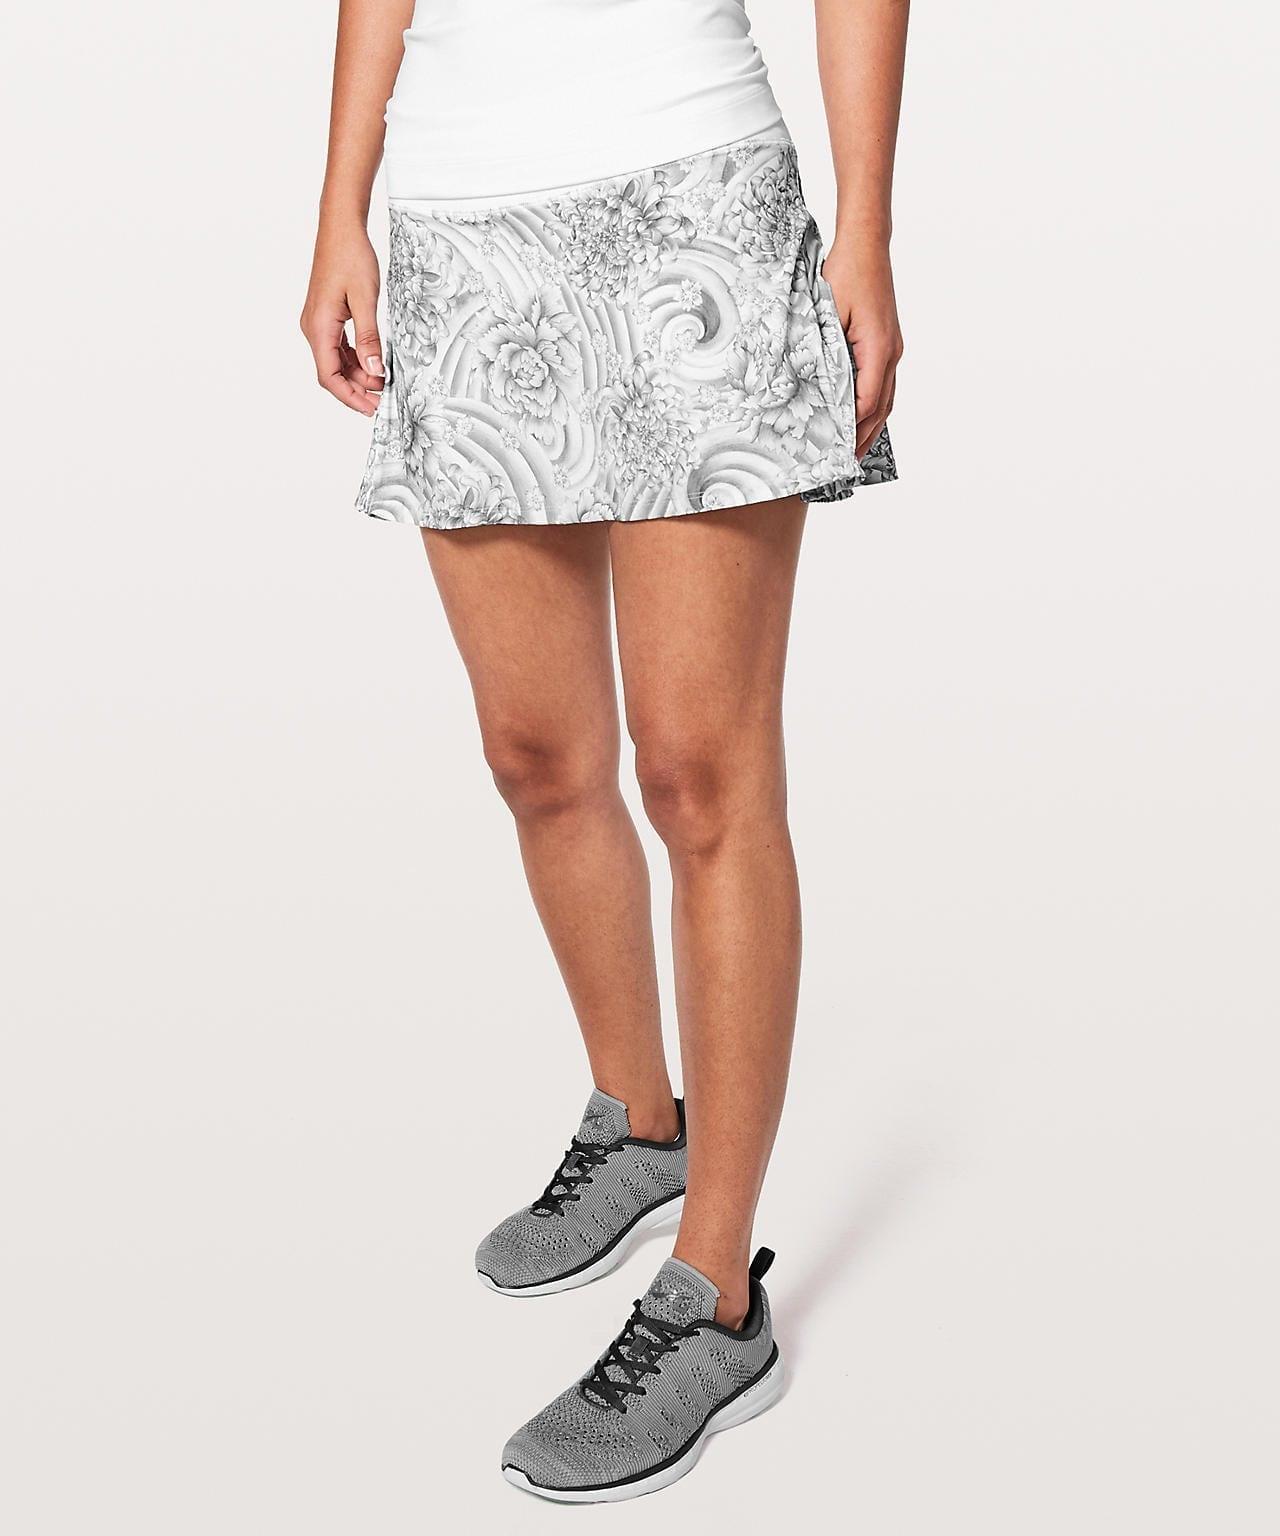 Play Off The Pleats Skirt Mini Twine White Multi